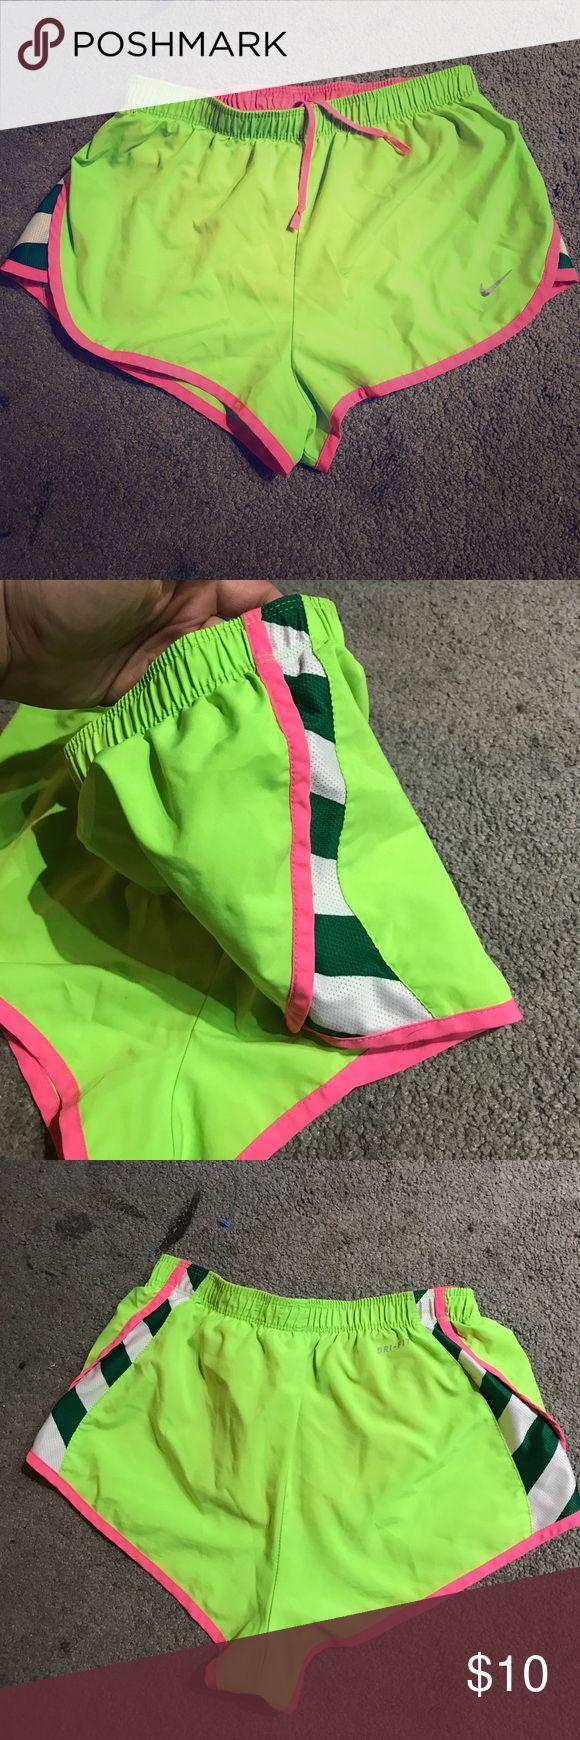 Women's XS Nike DRI-FIT athletic shorts Neon green Never worn super cute bright neon green with pink trim Nike shorts Nike Shorts